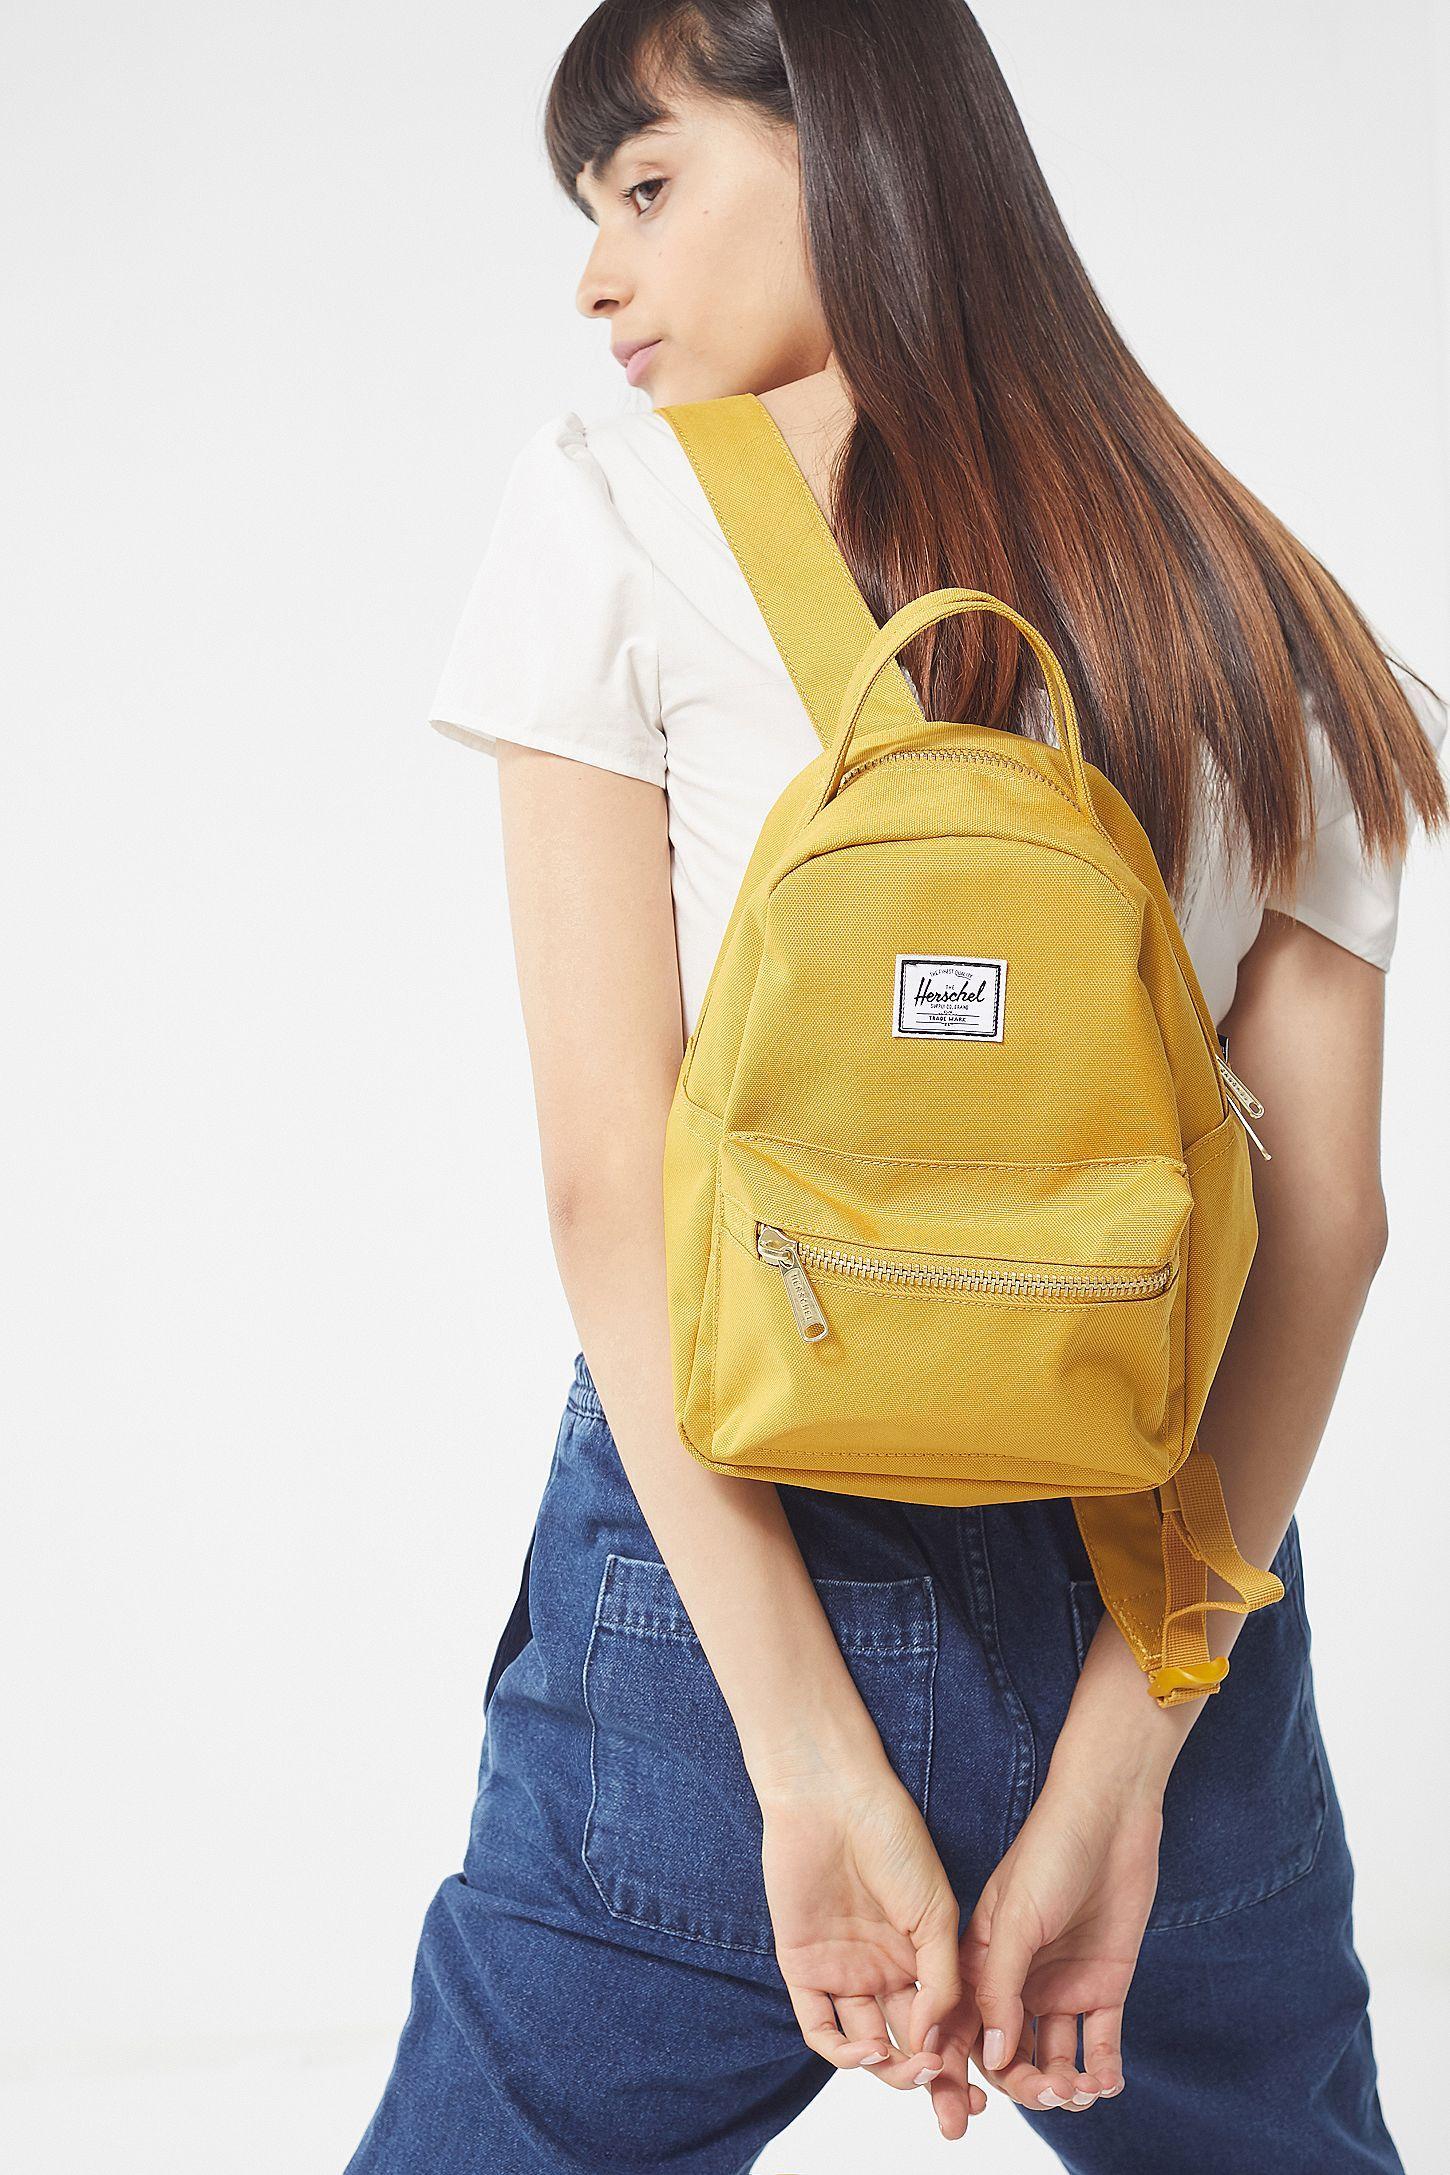 d2c902037481 Slide View  1  Herschel Supply Co. Nova Mini Backpack